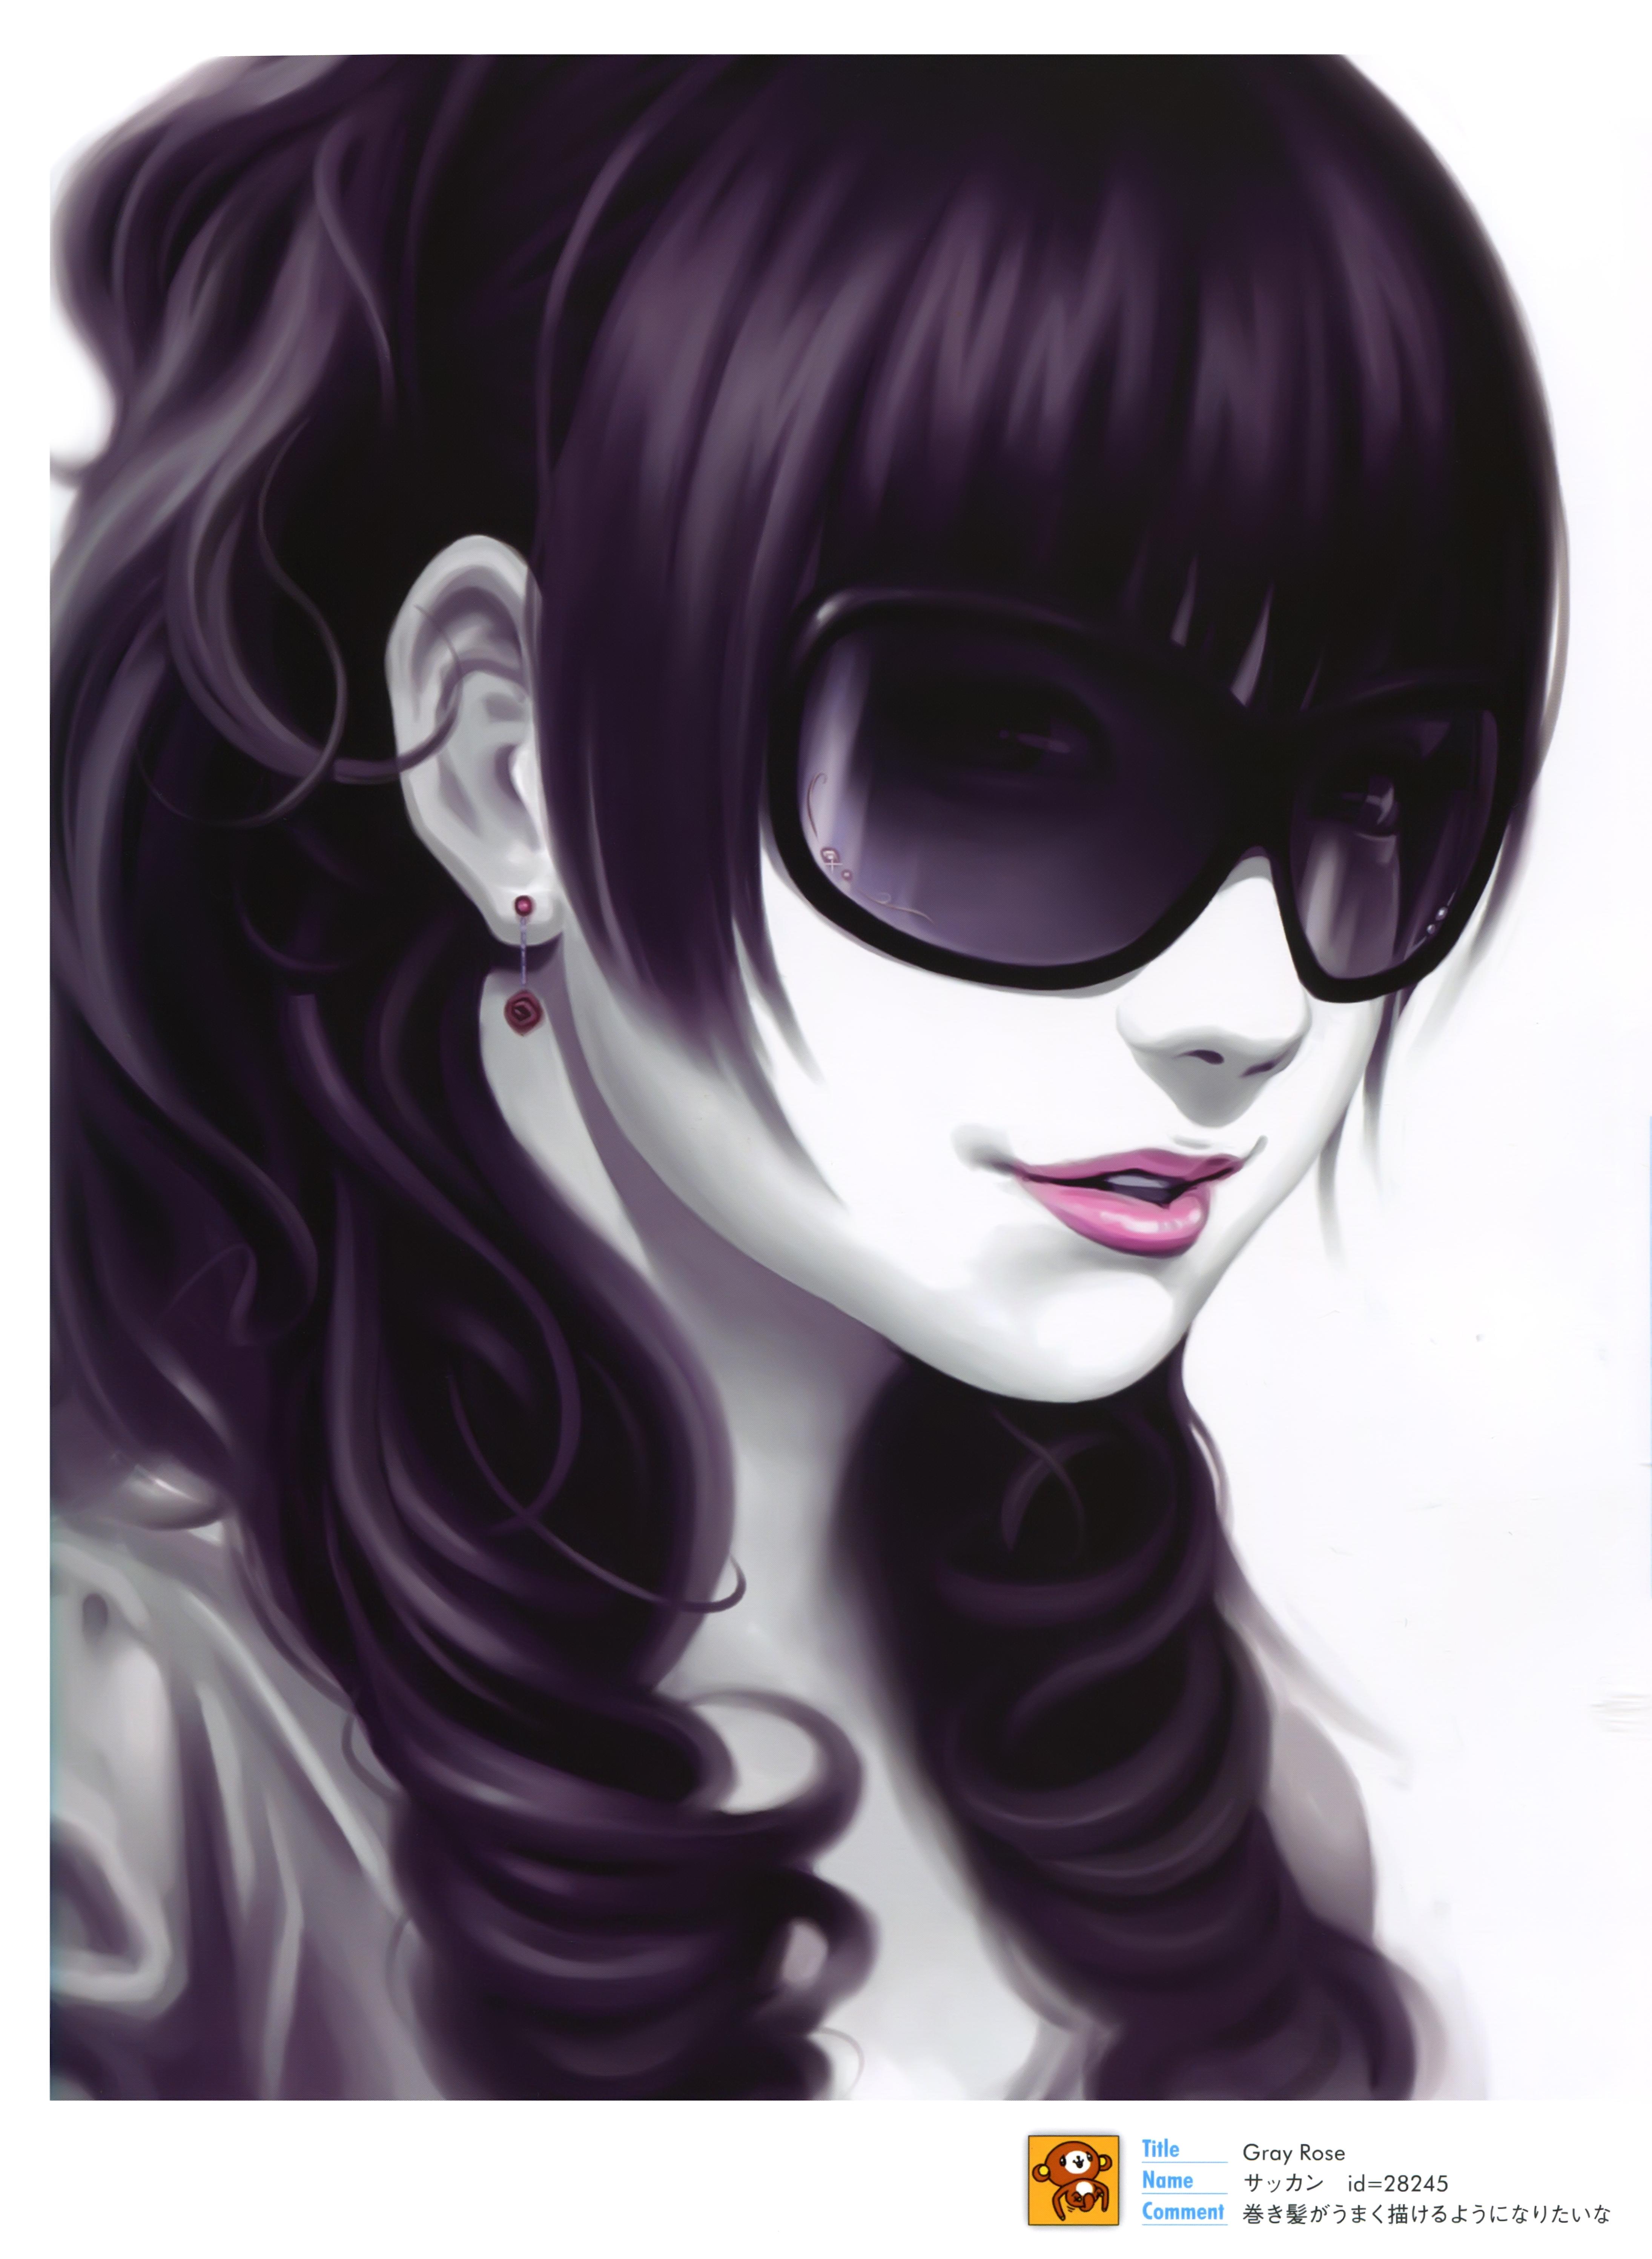 Anime Girl Wearing Sunglasses Bitterroot Public Library